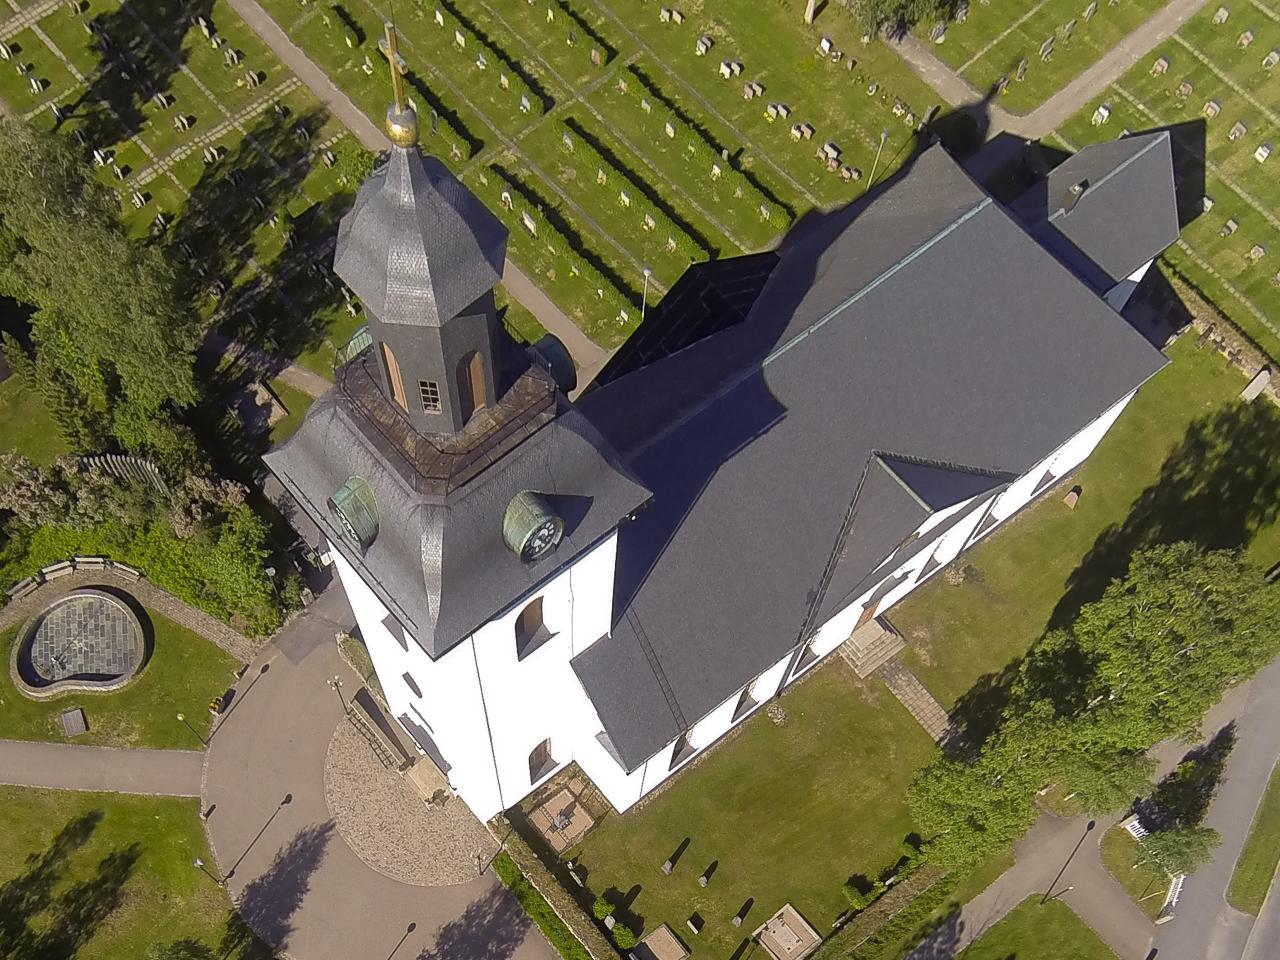 Nu skall Svegs kyrka få nytt tak